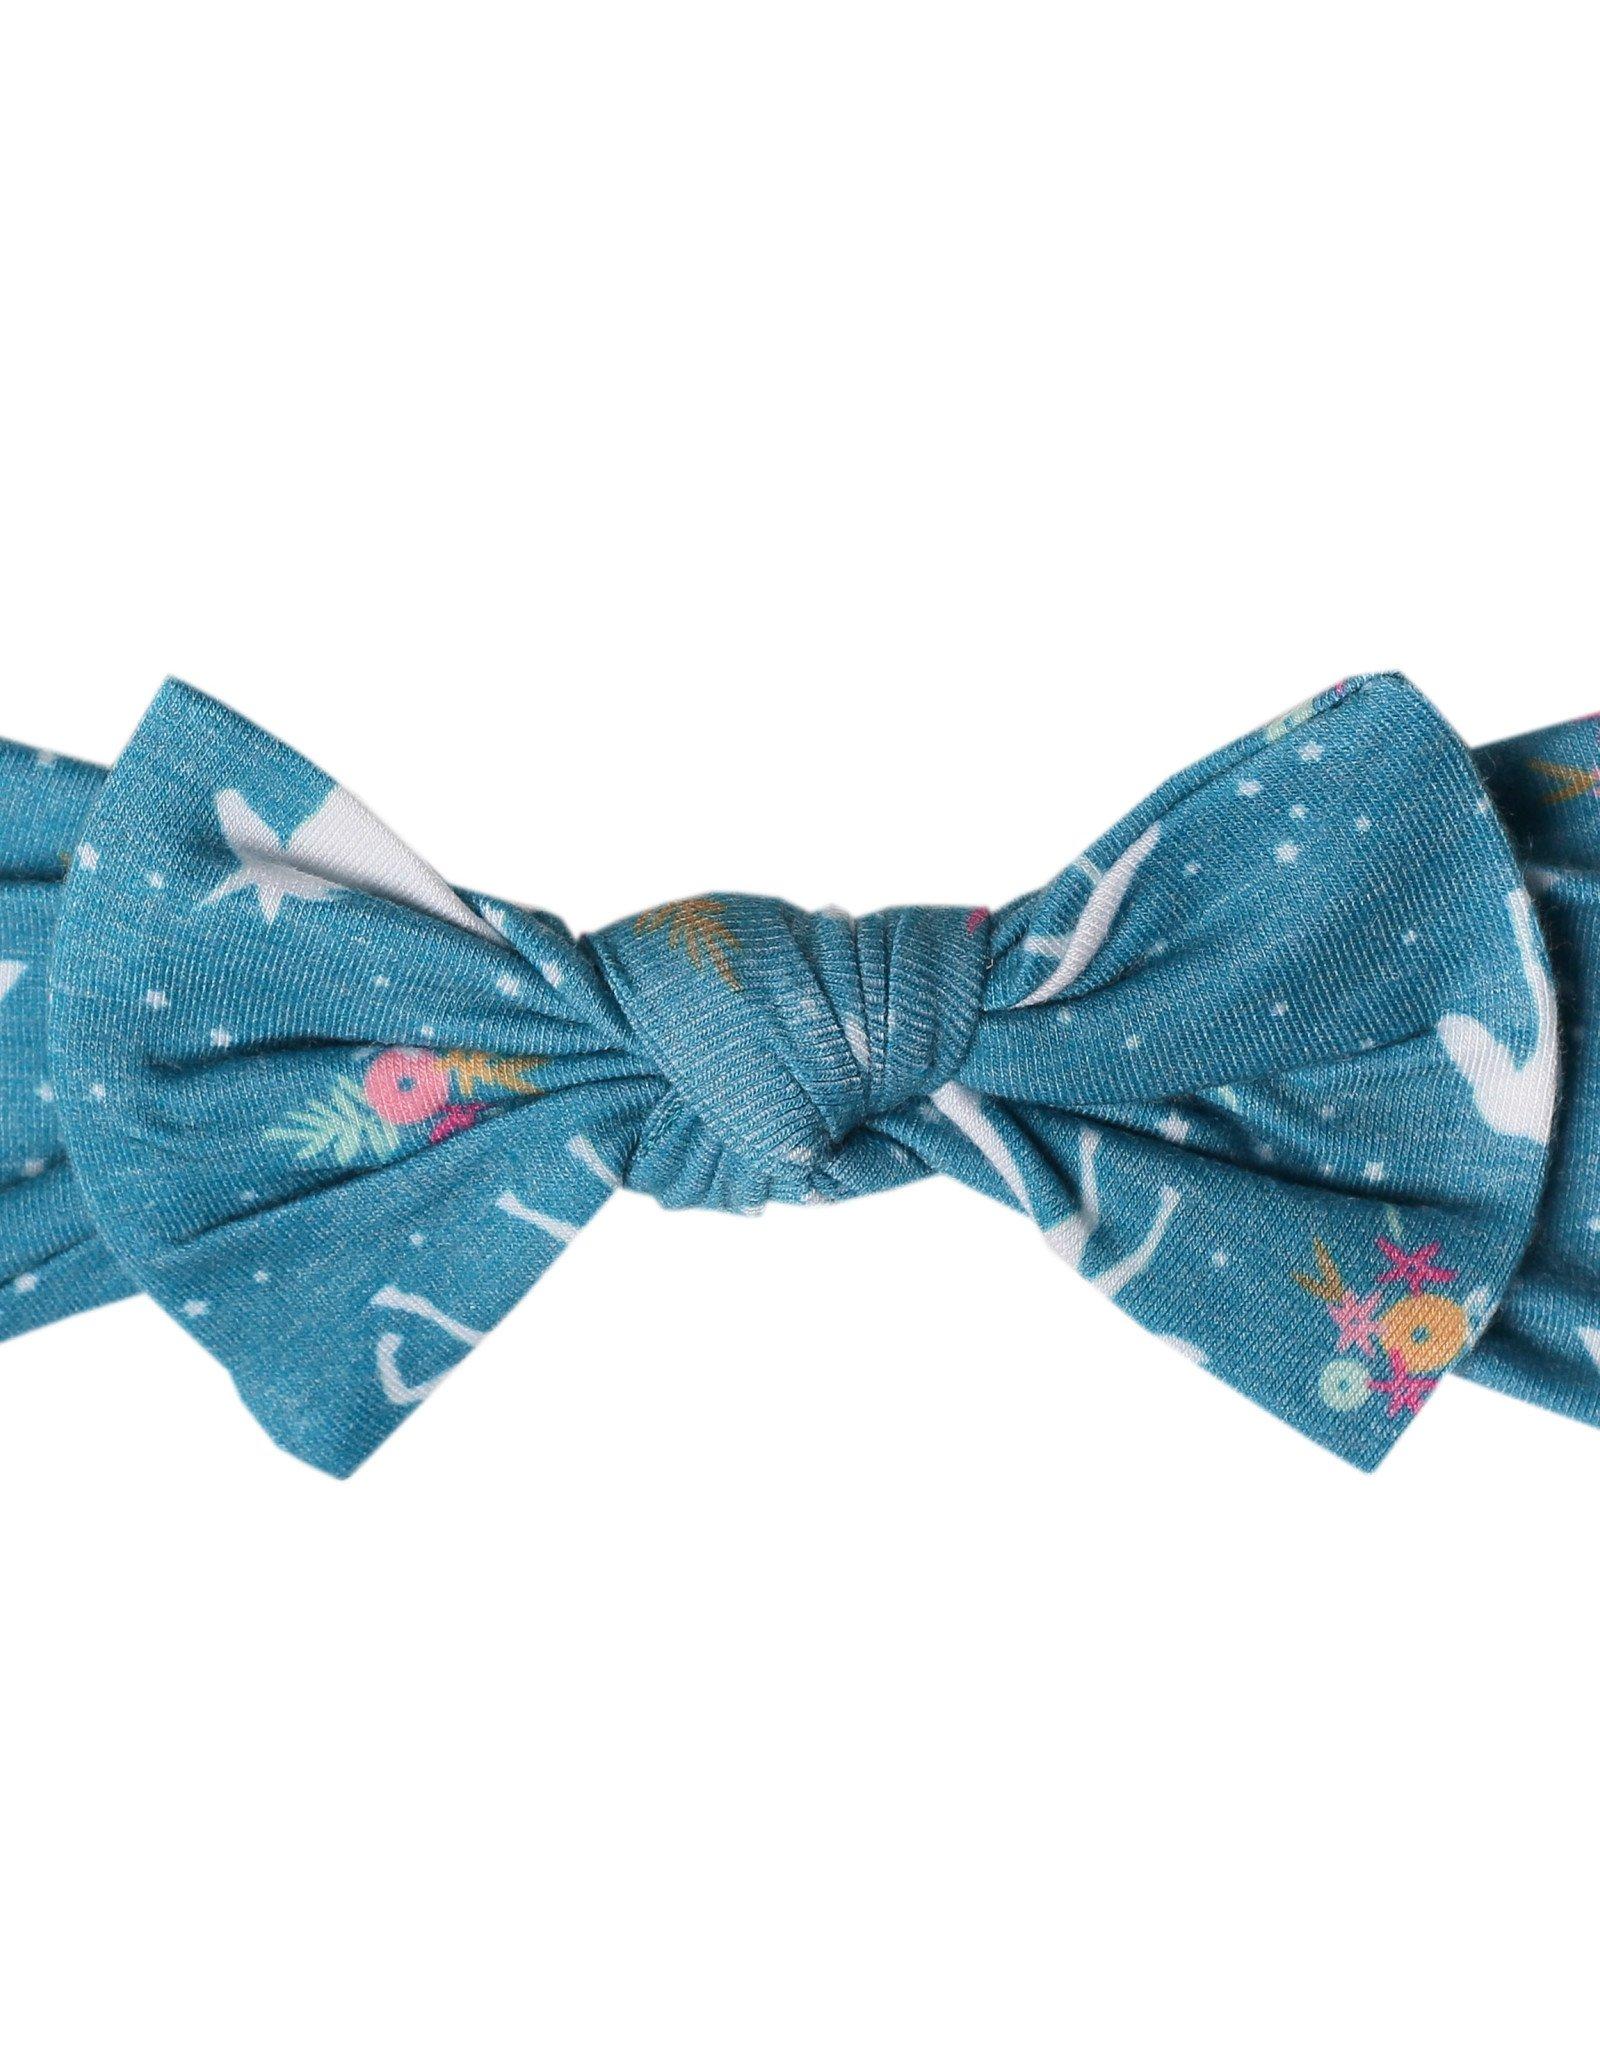 Copper Pearl Knit Headband Bow Whimsy